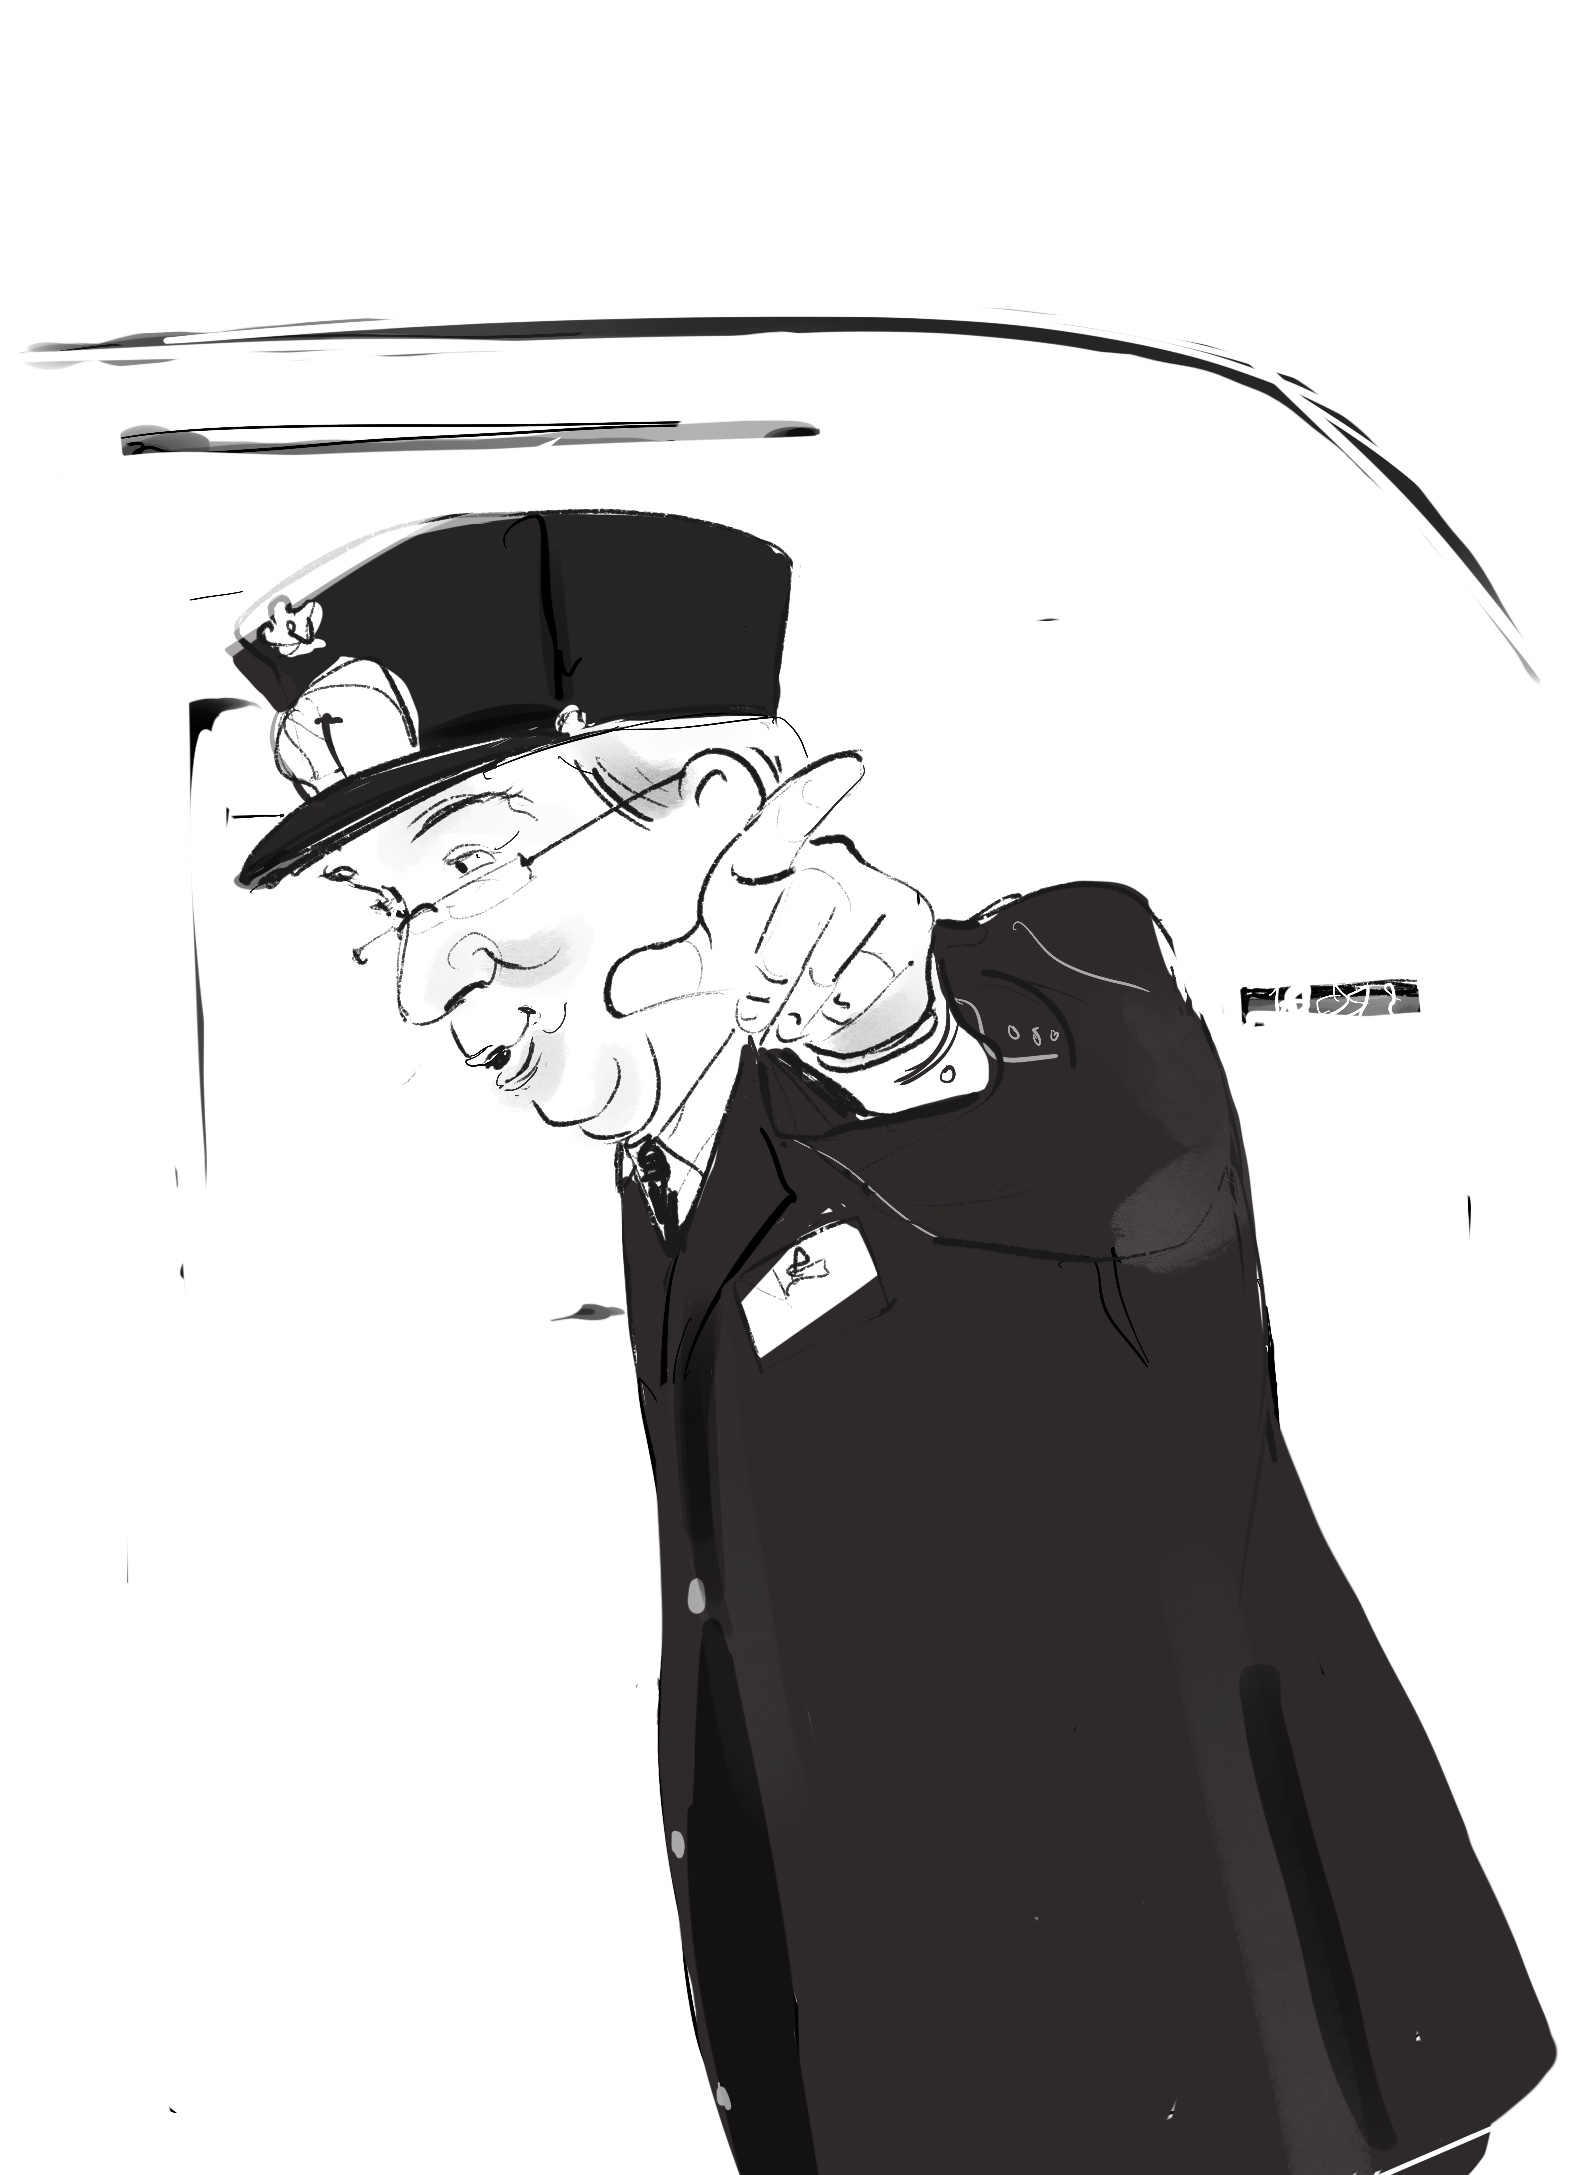 Conductor Joe